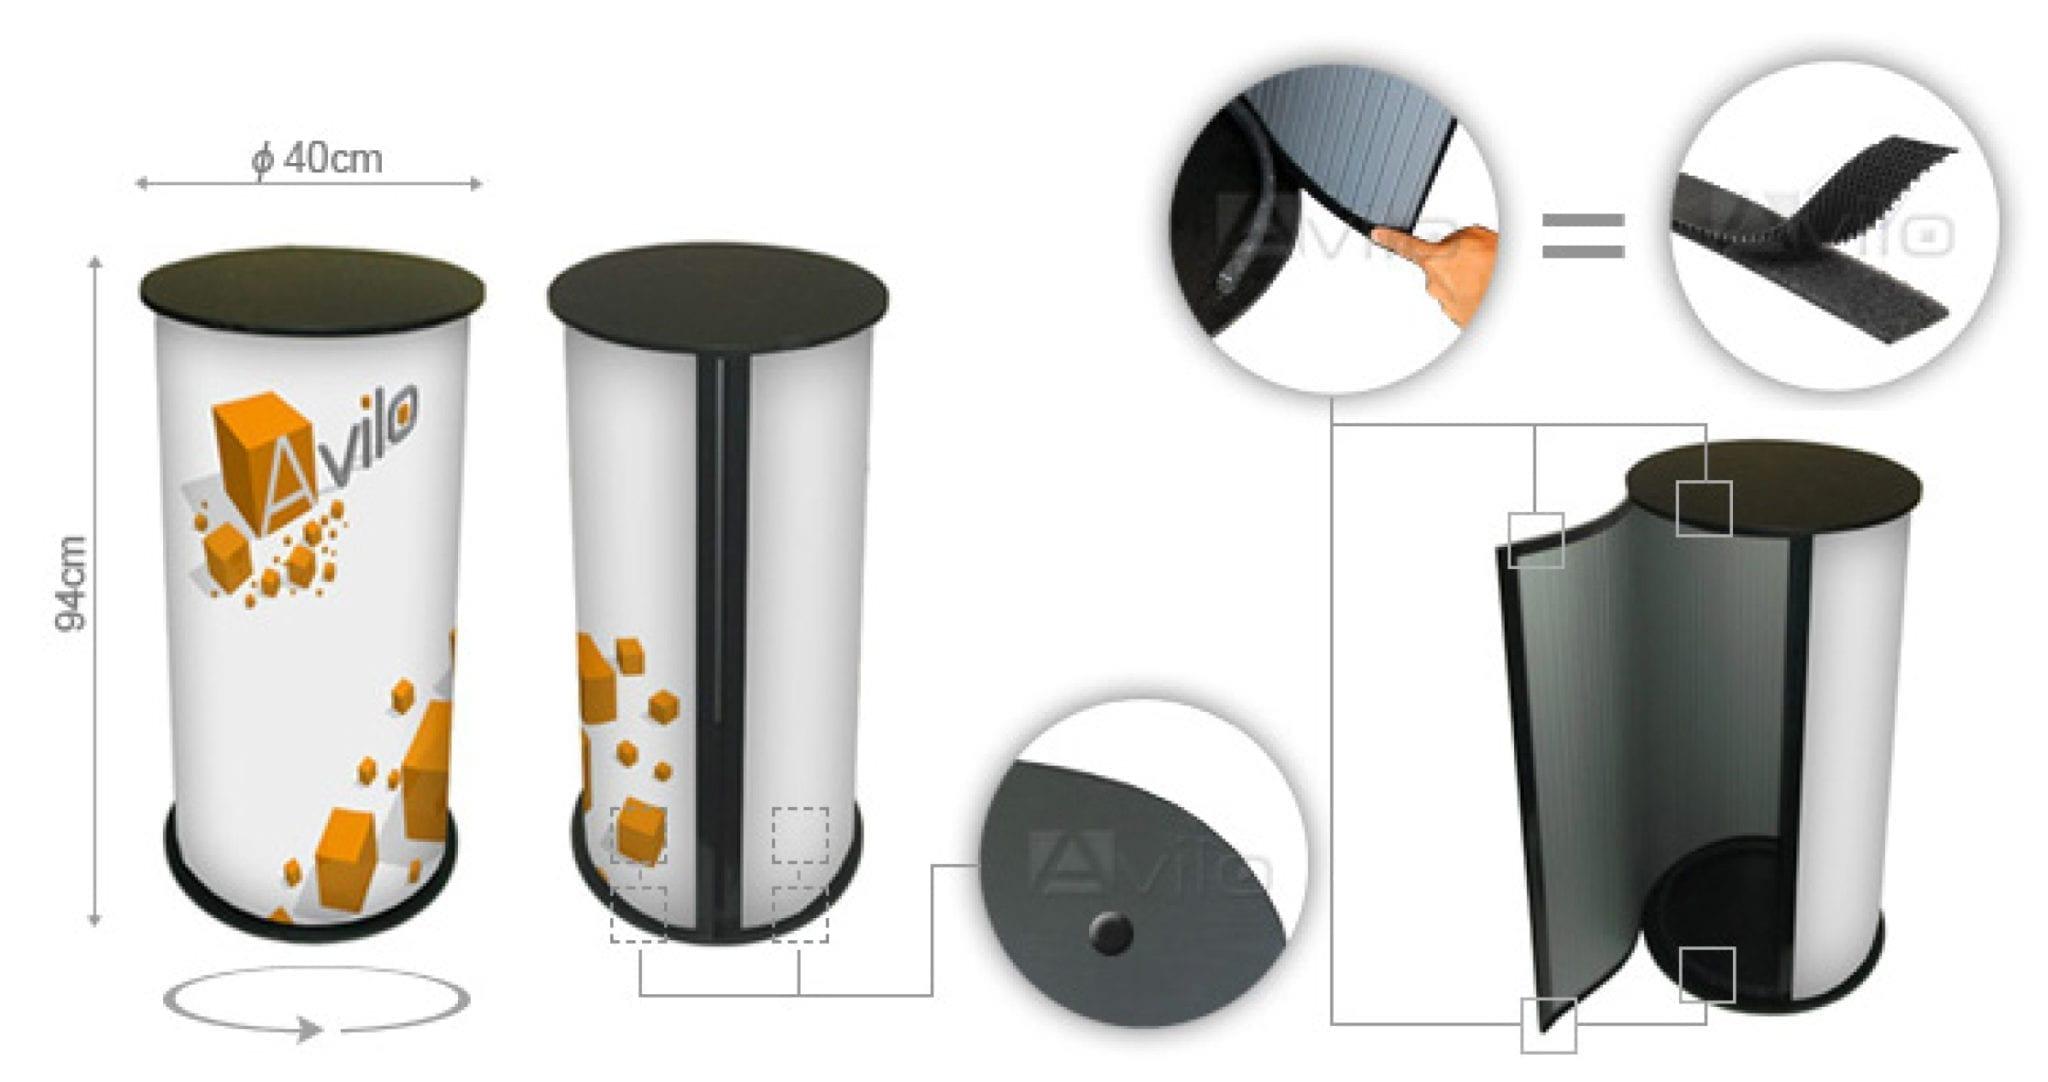 Messebord - Allprofil AS - Trykksaker - Profilering - Klær - Digital skilting - Tjenester - Kontakt